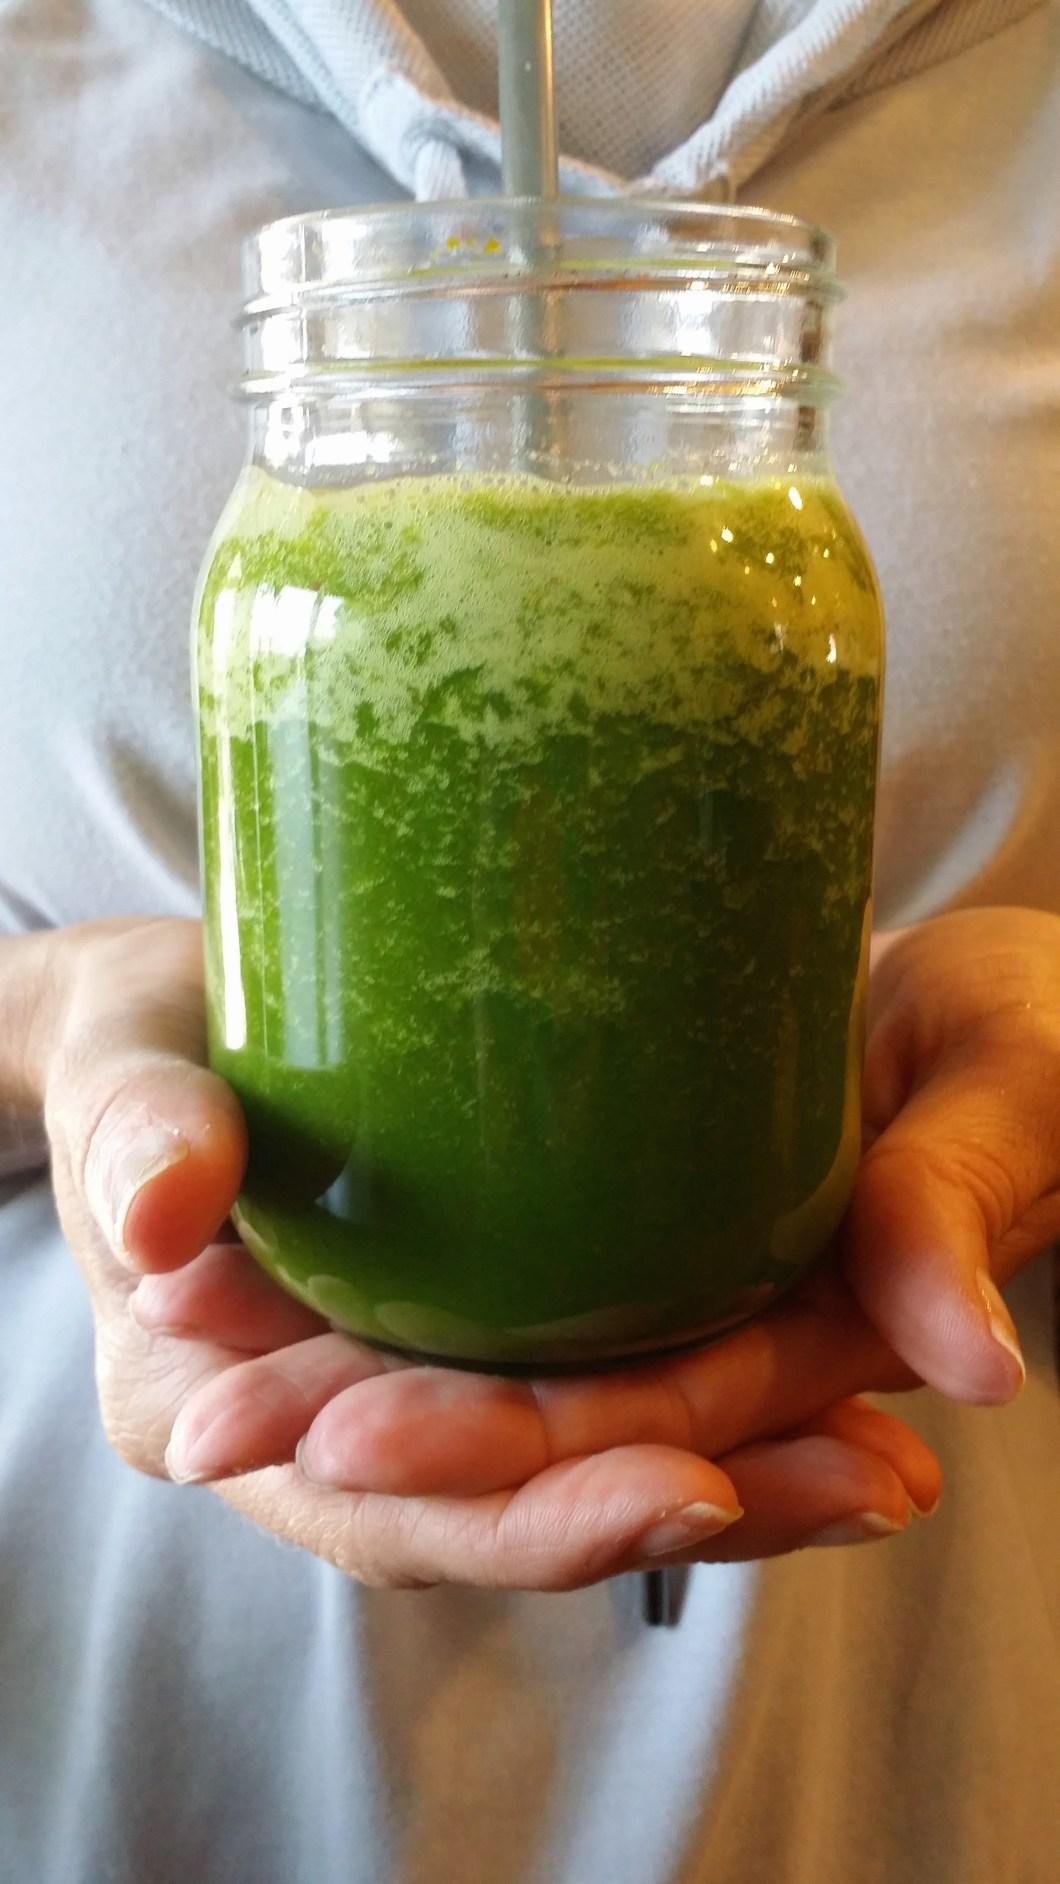 Cleansing & refreshing, blender Green Smoothie